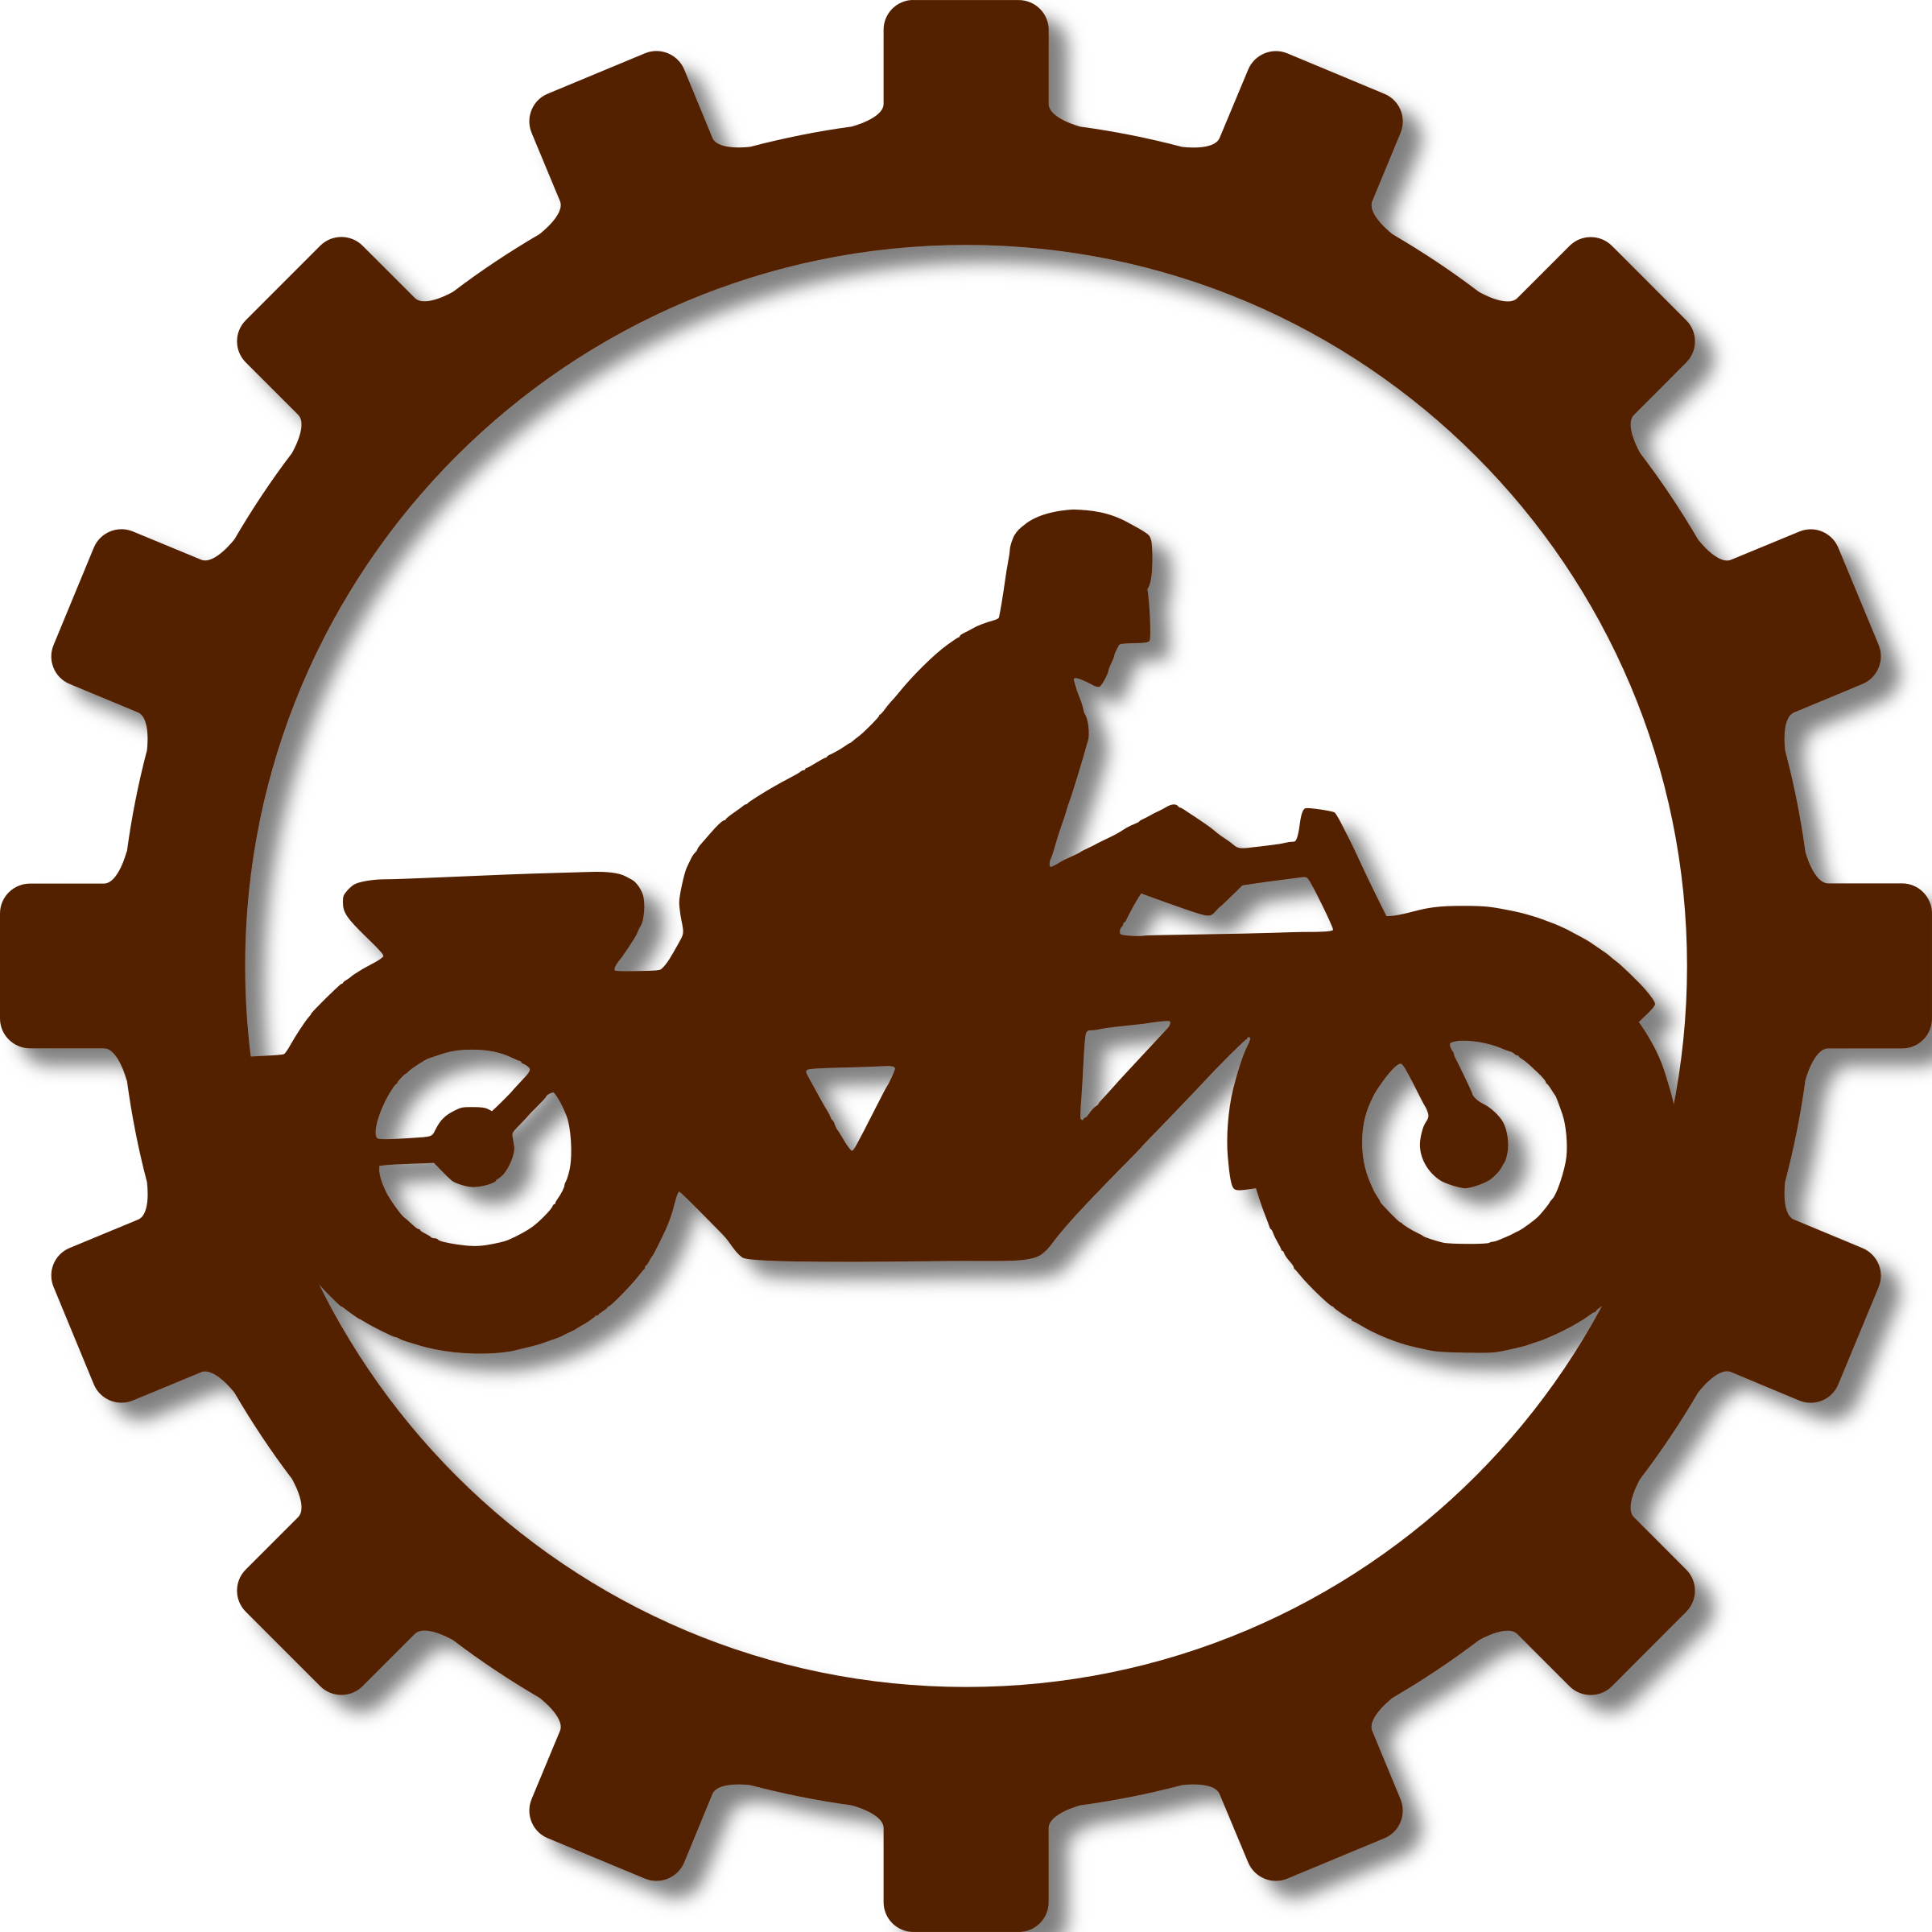 Motorcycle clipart orange. Oldtimer mechanic part big